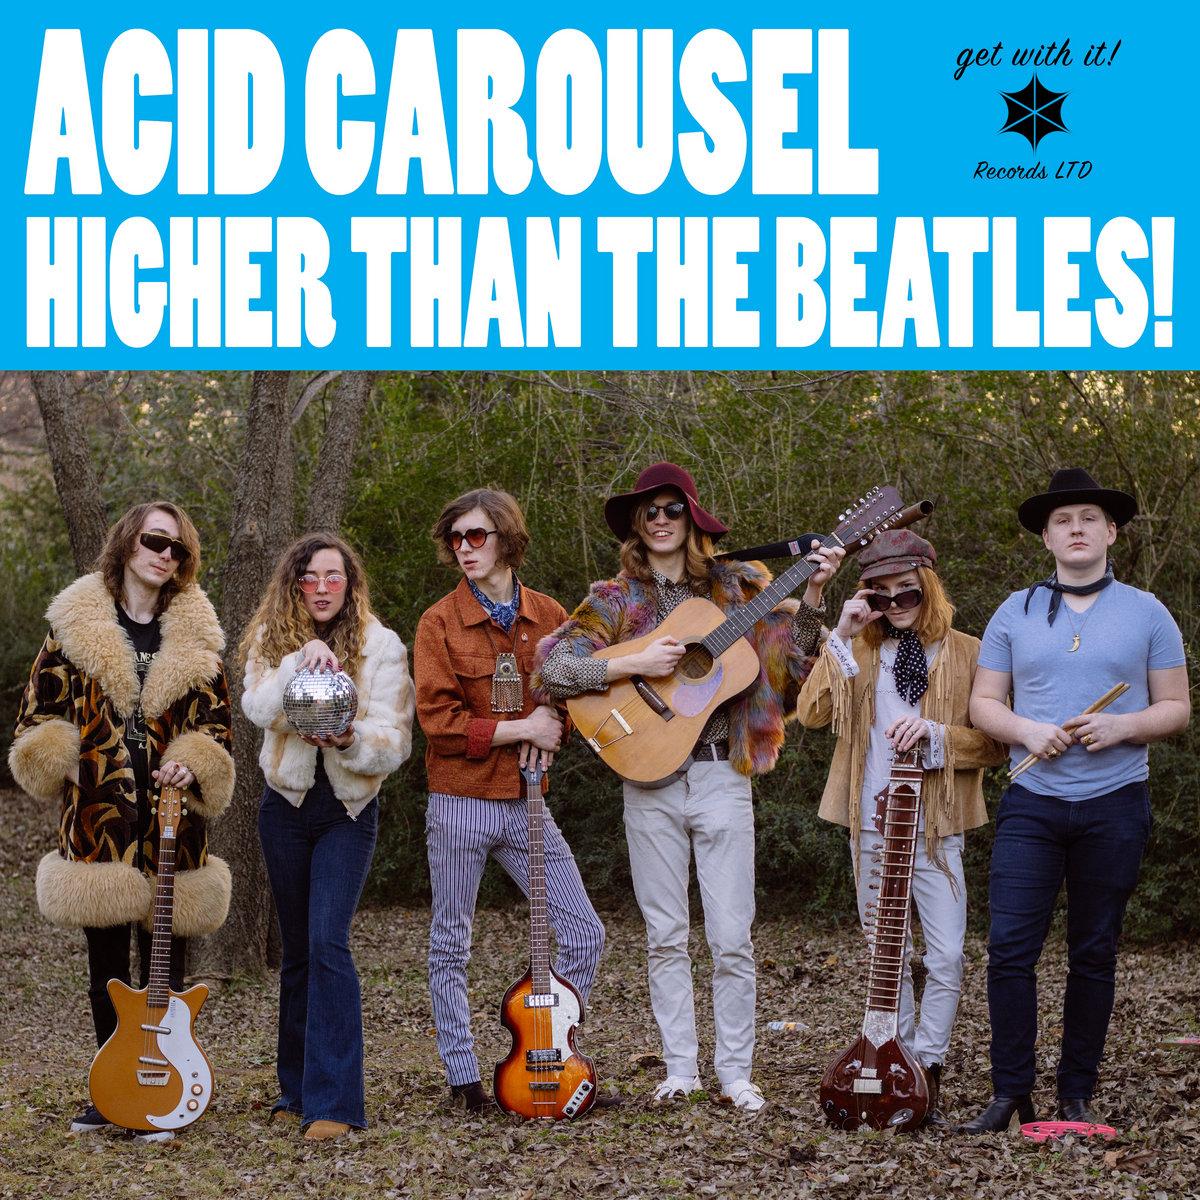 Higher Than The Beatles! | Acid Carousel